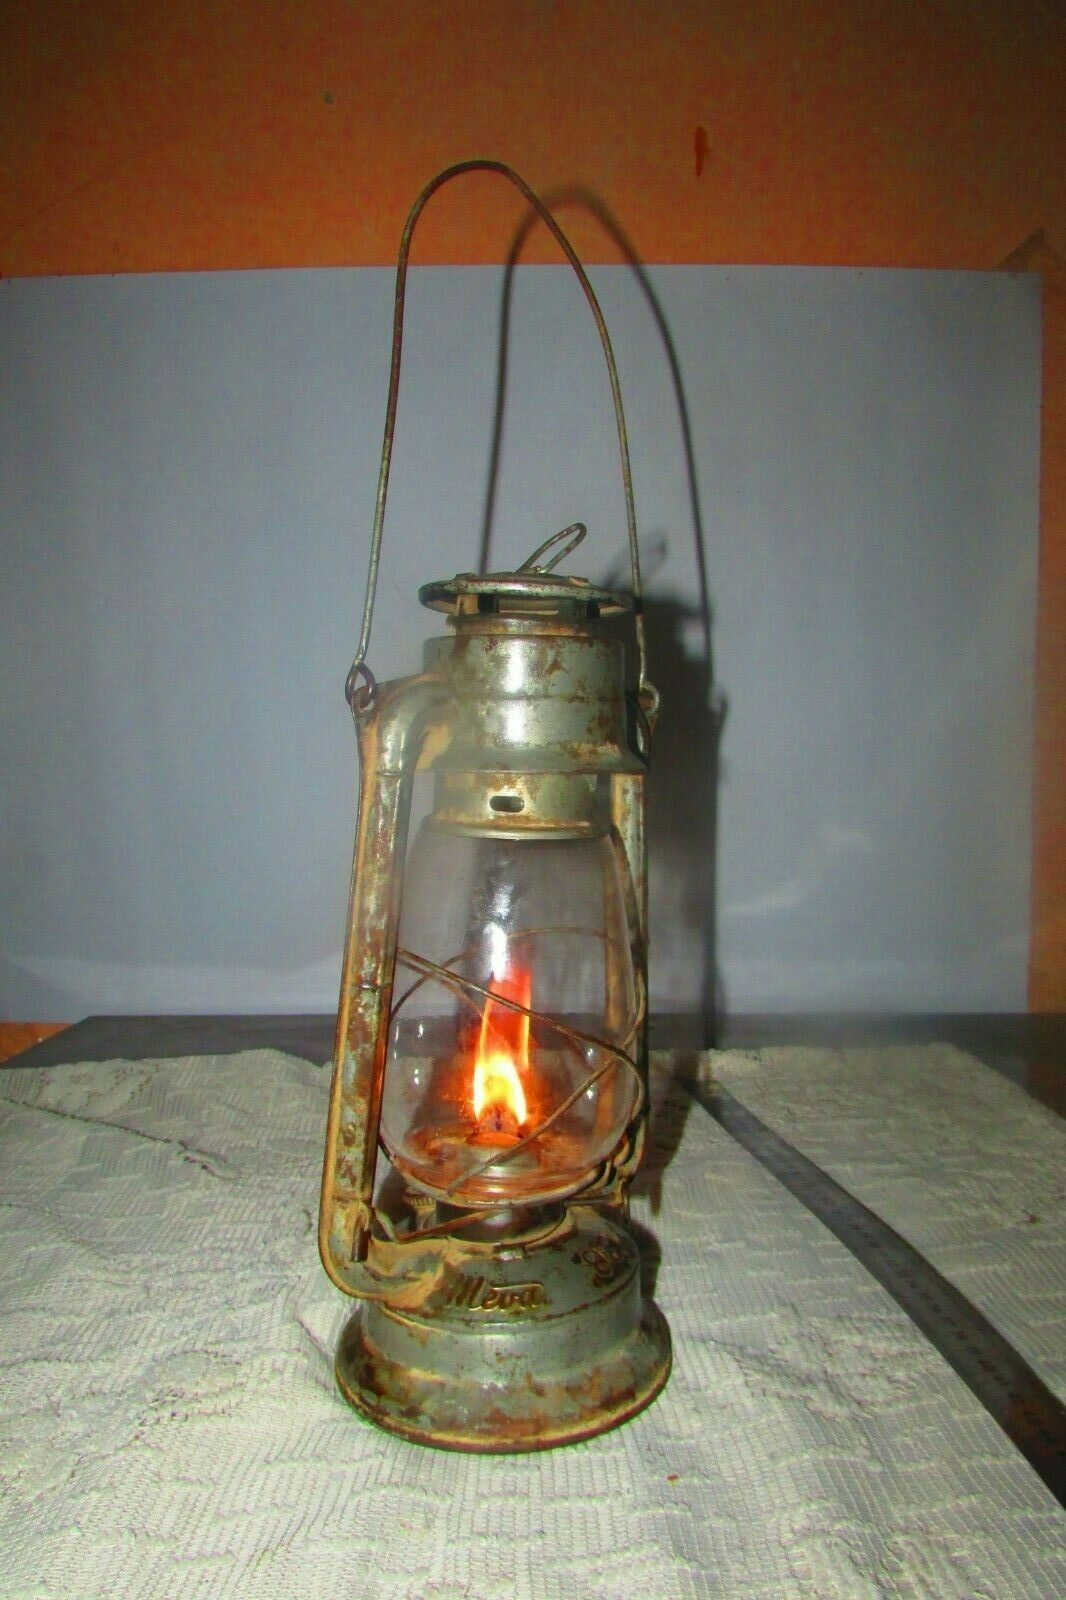 Details about Vintage (MEVA) oil kerosene lamp made in